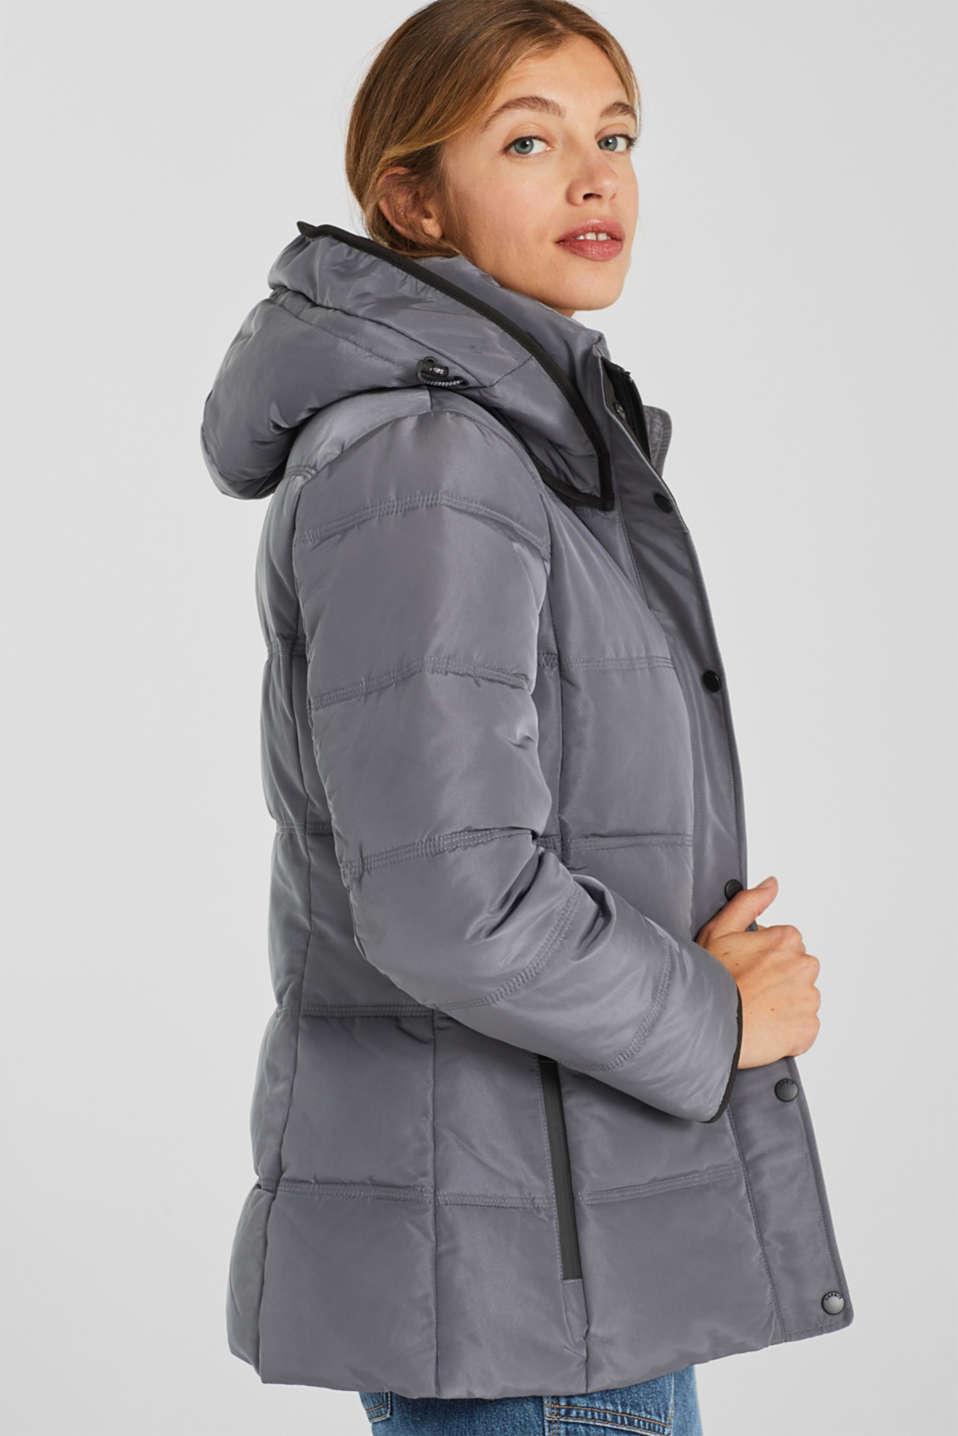 Jackets outdoor woven, DARK GREY, detail image number 5